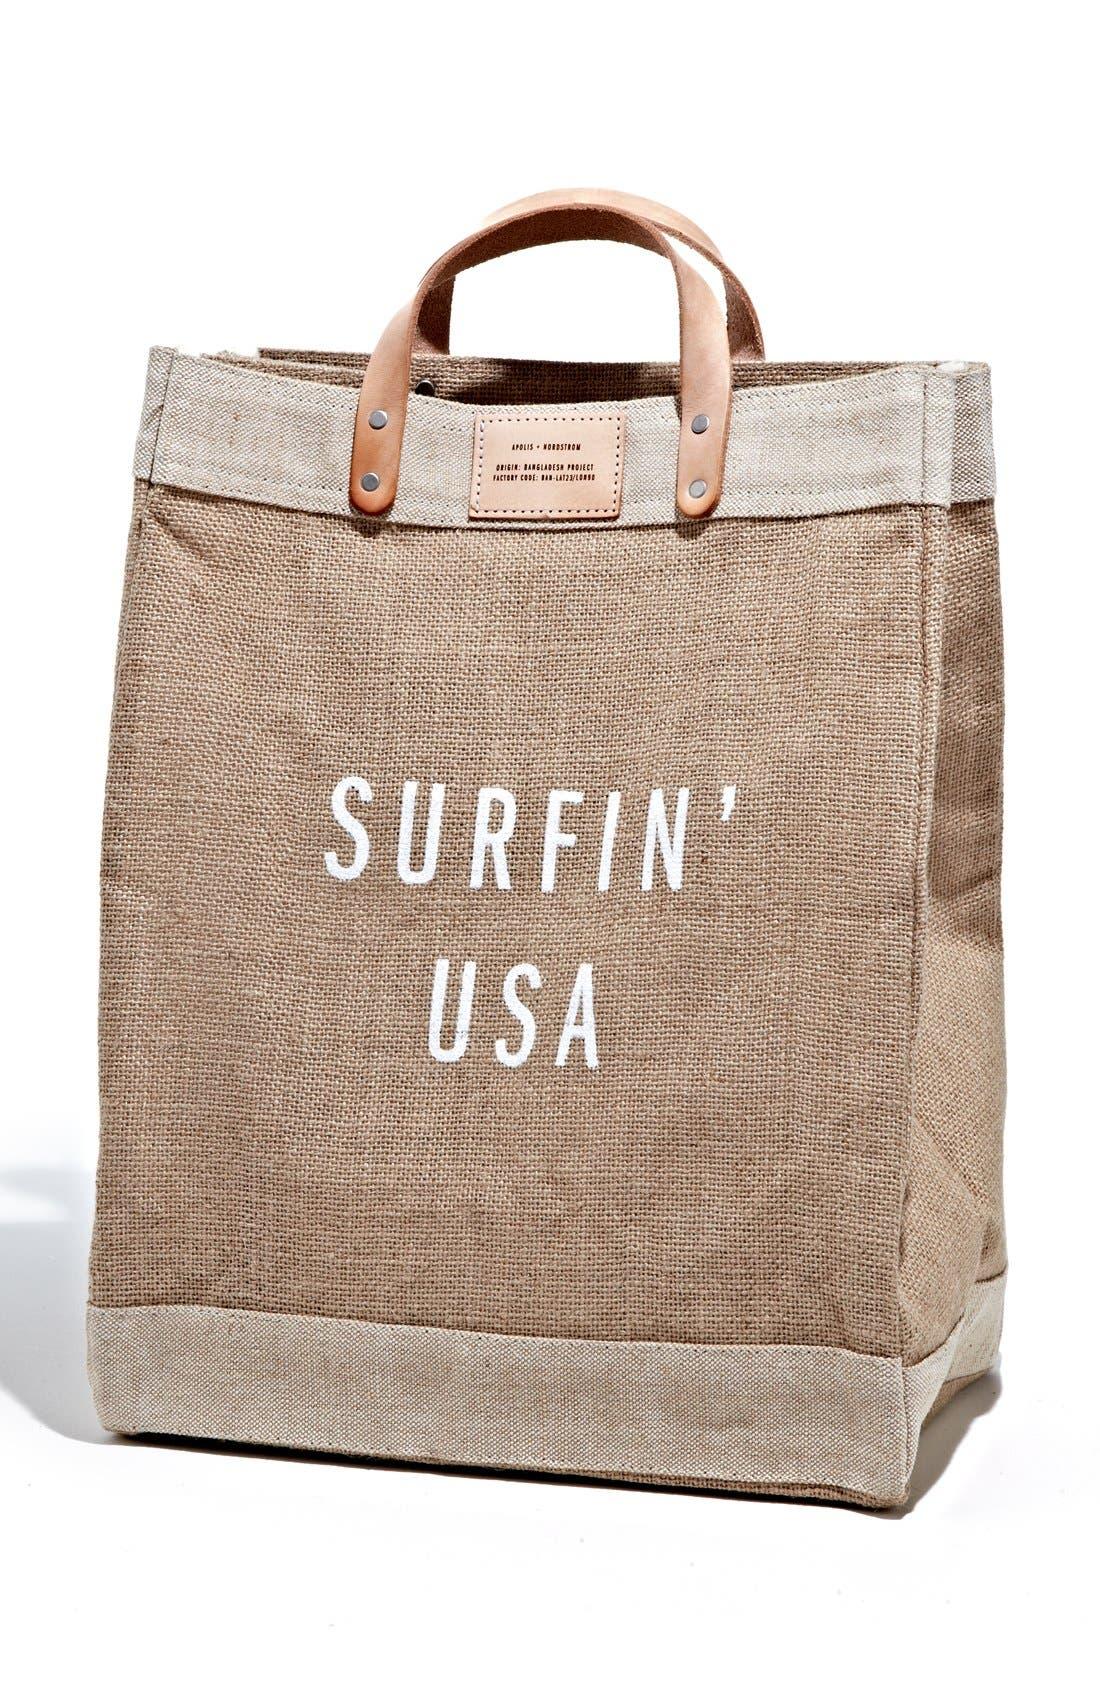 Alternate Image 1 Selected - Apolis 'Surfin USA' Market Bag